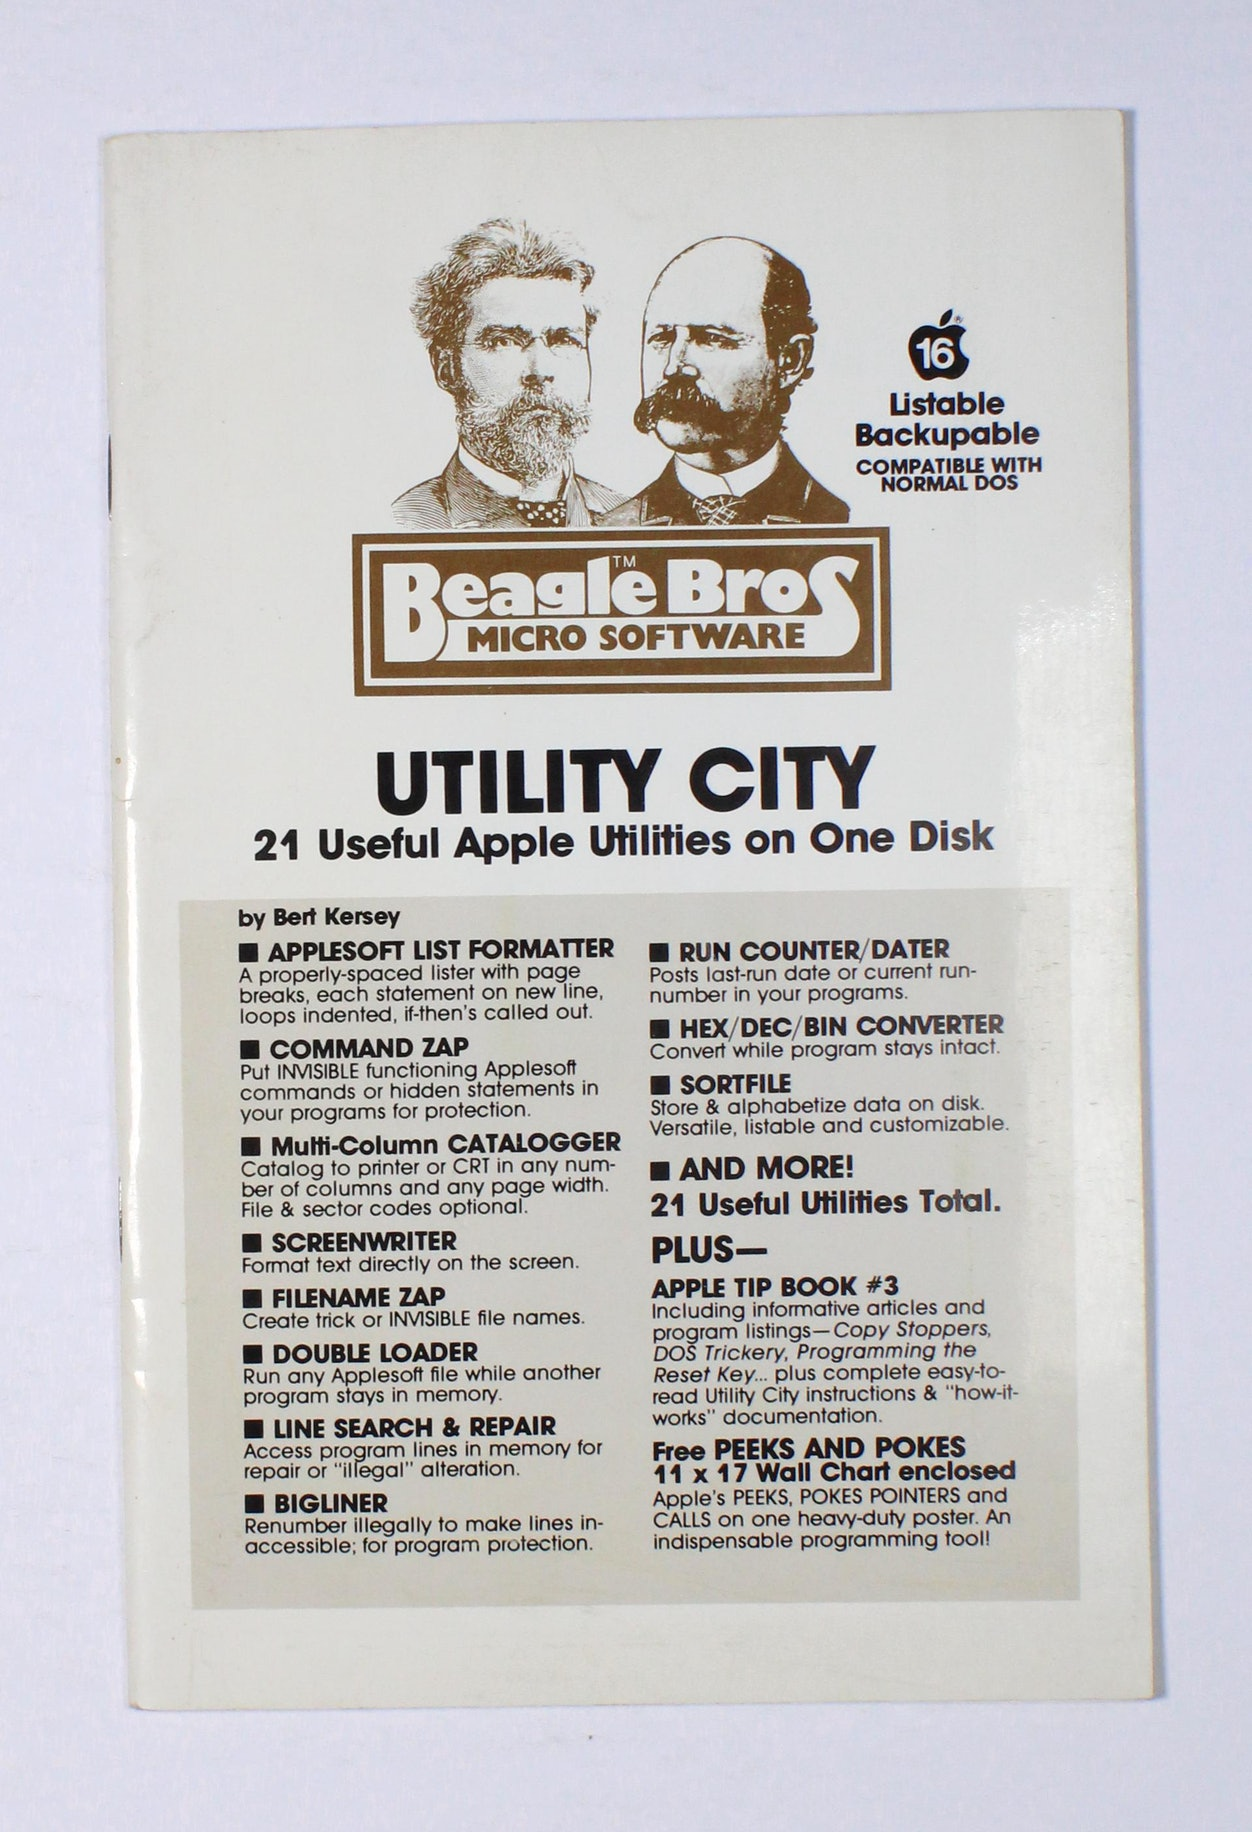 Utility City